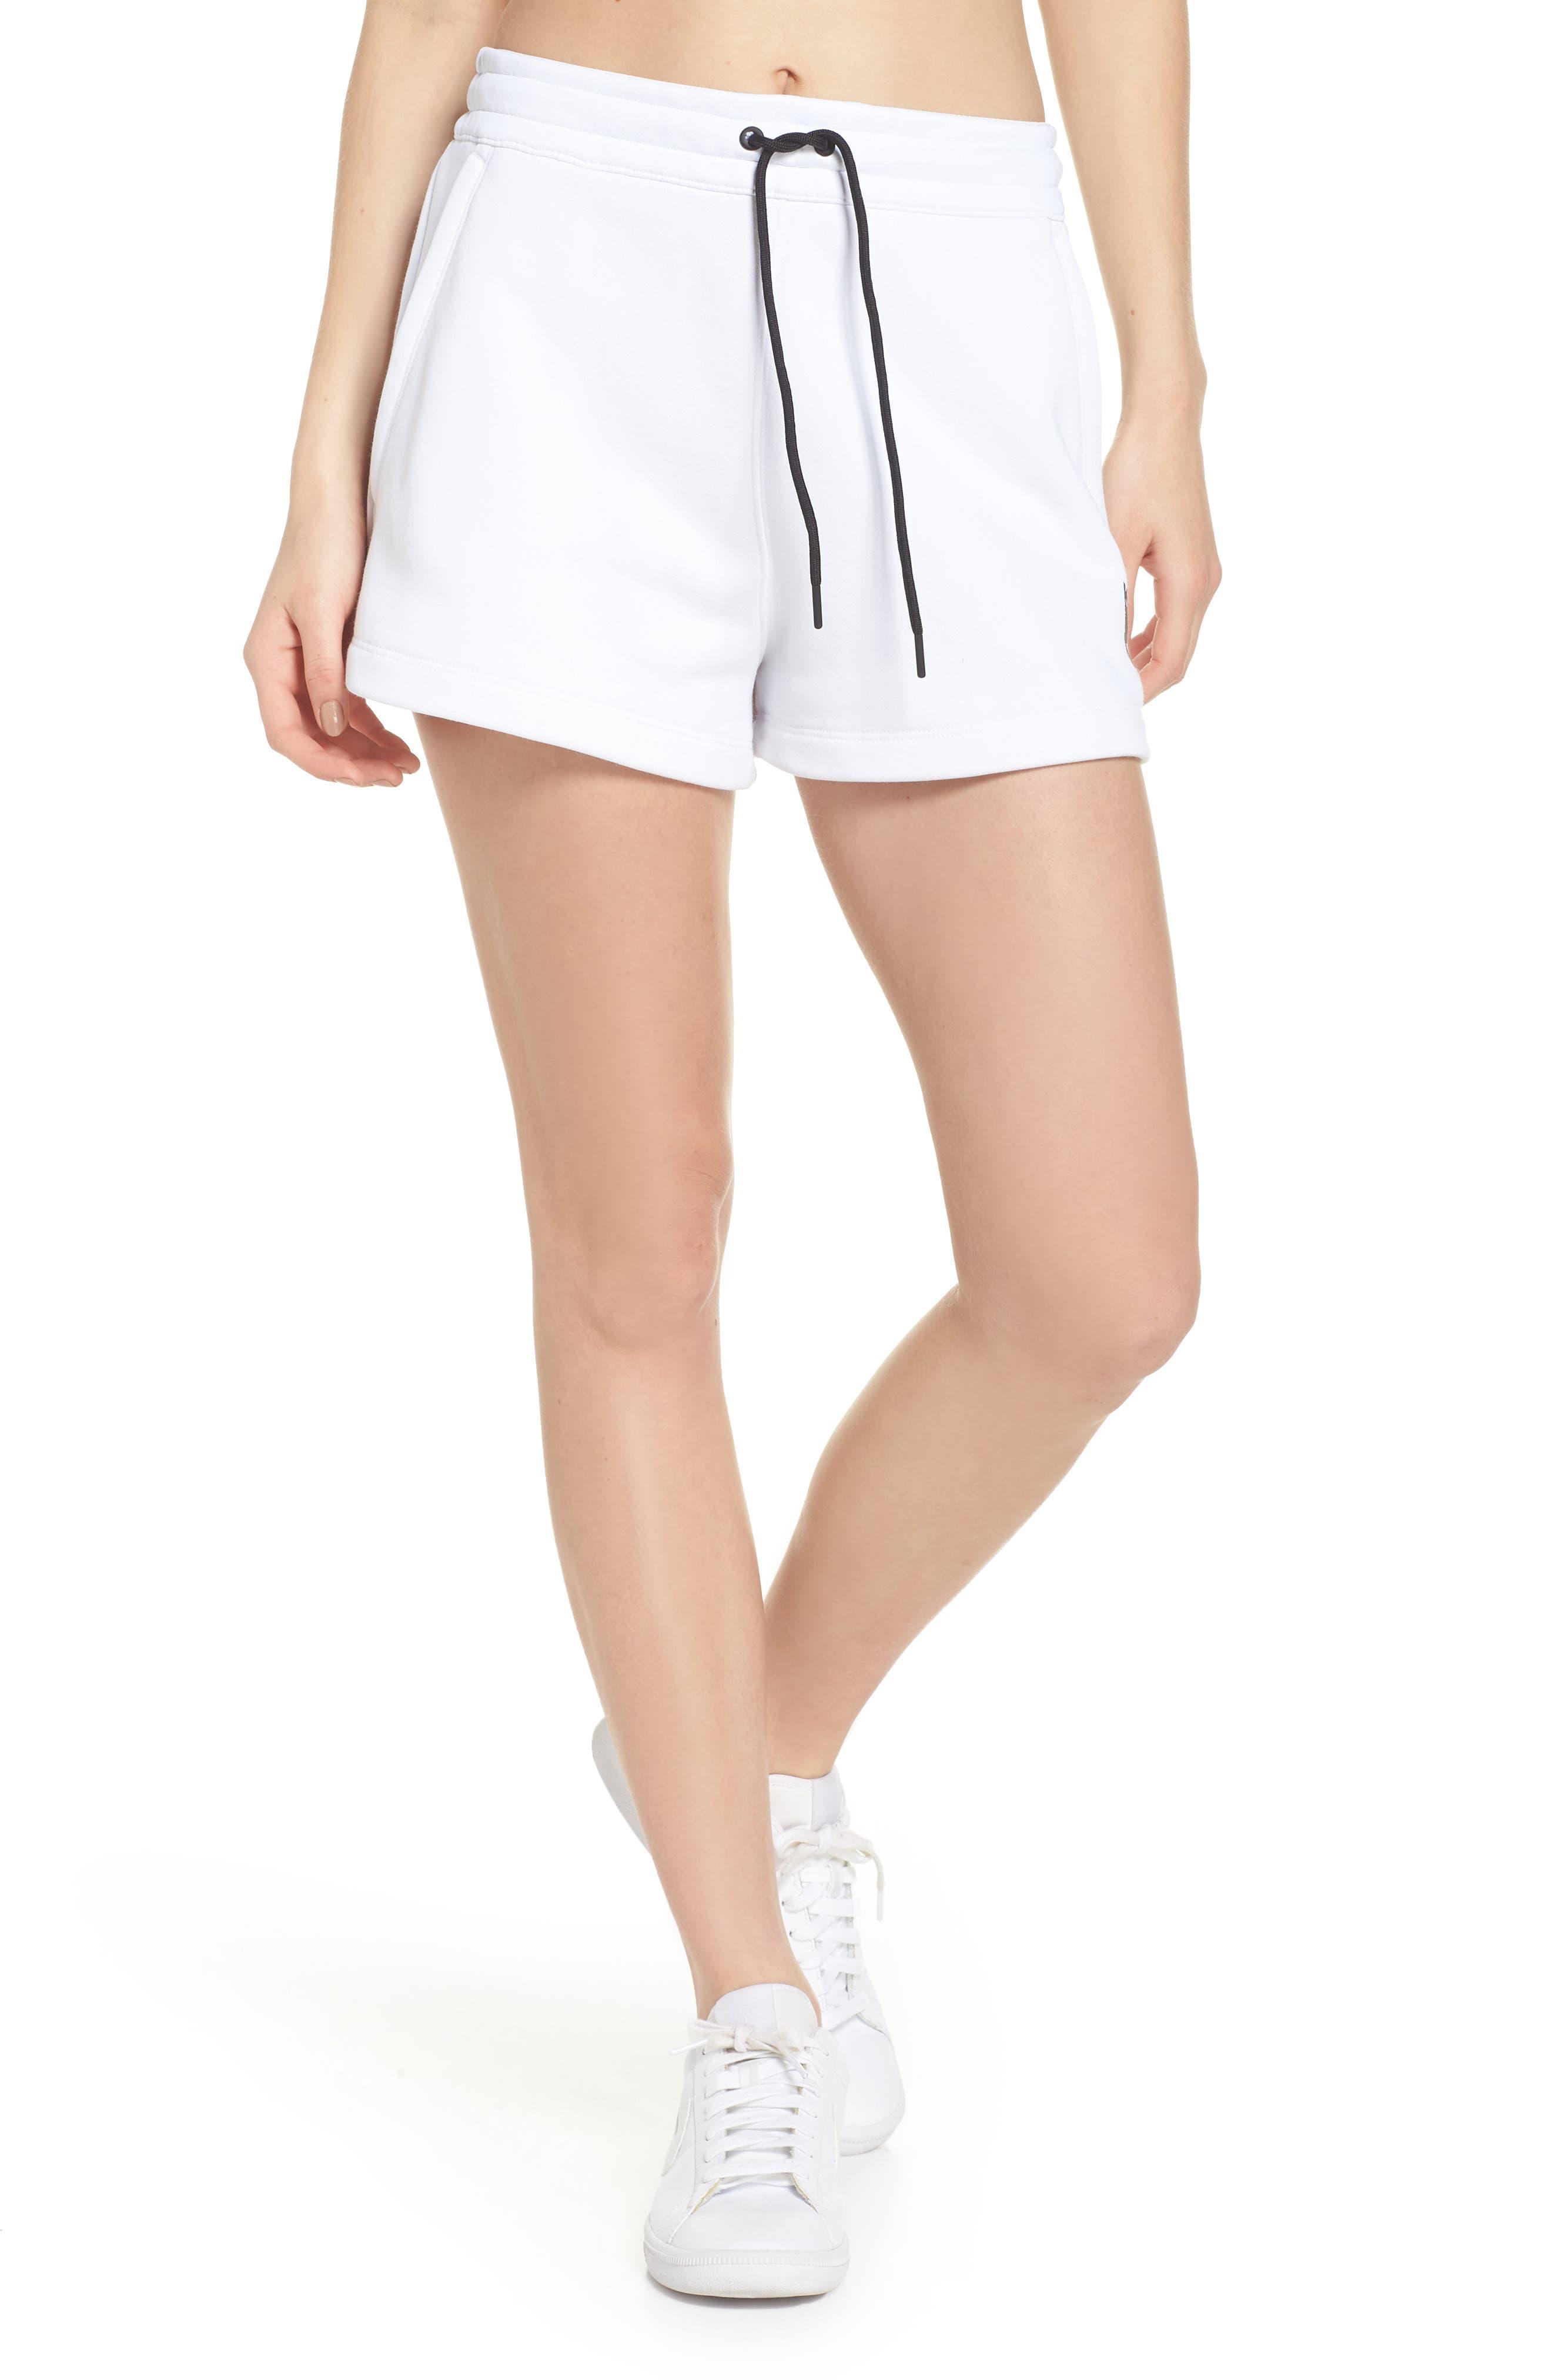 Nike NikeLab Collection Women's Fleece Shorts